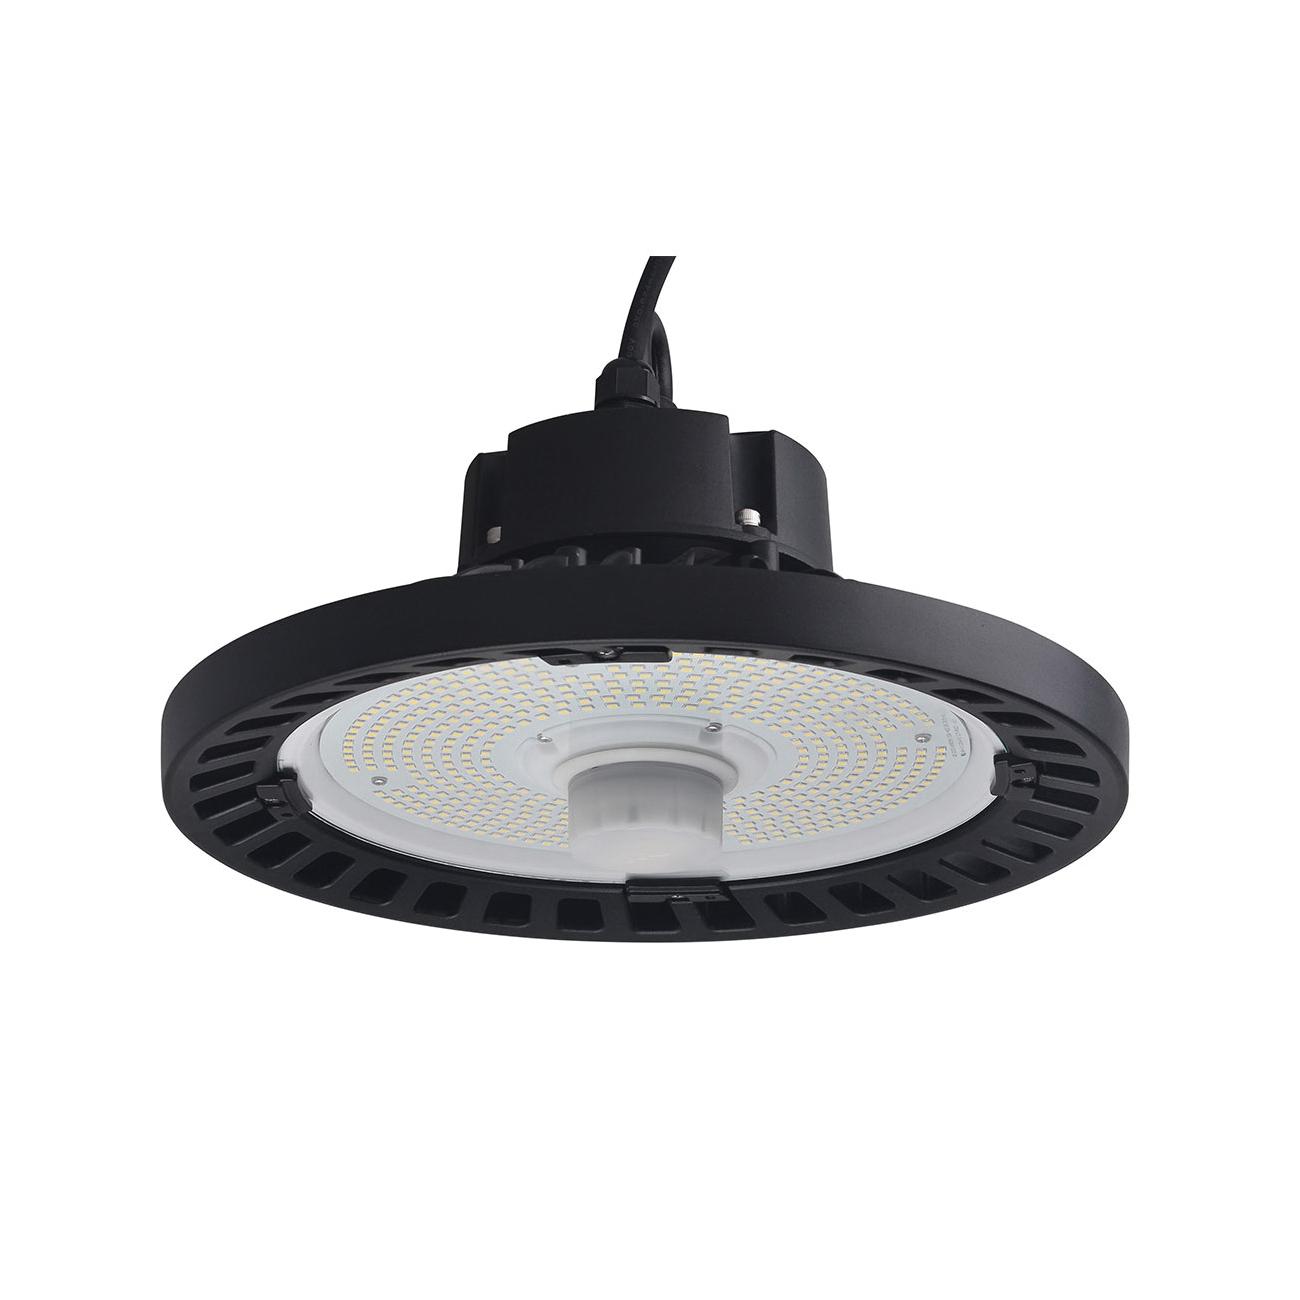 CSC LED HB7B-150W-50K-LV-GL